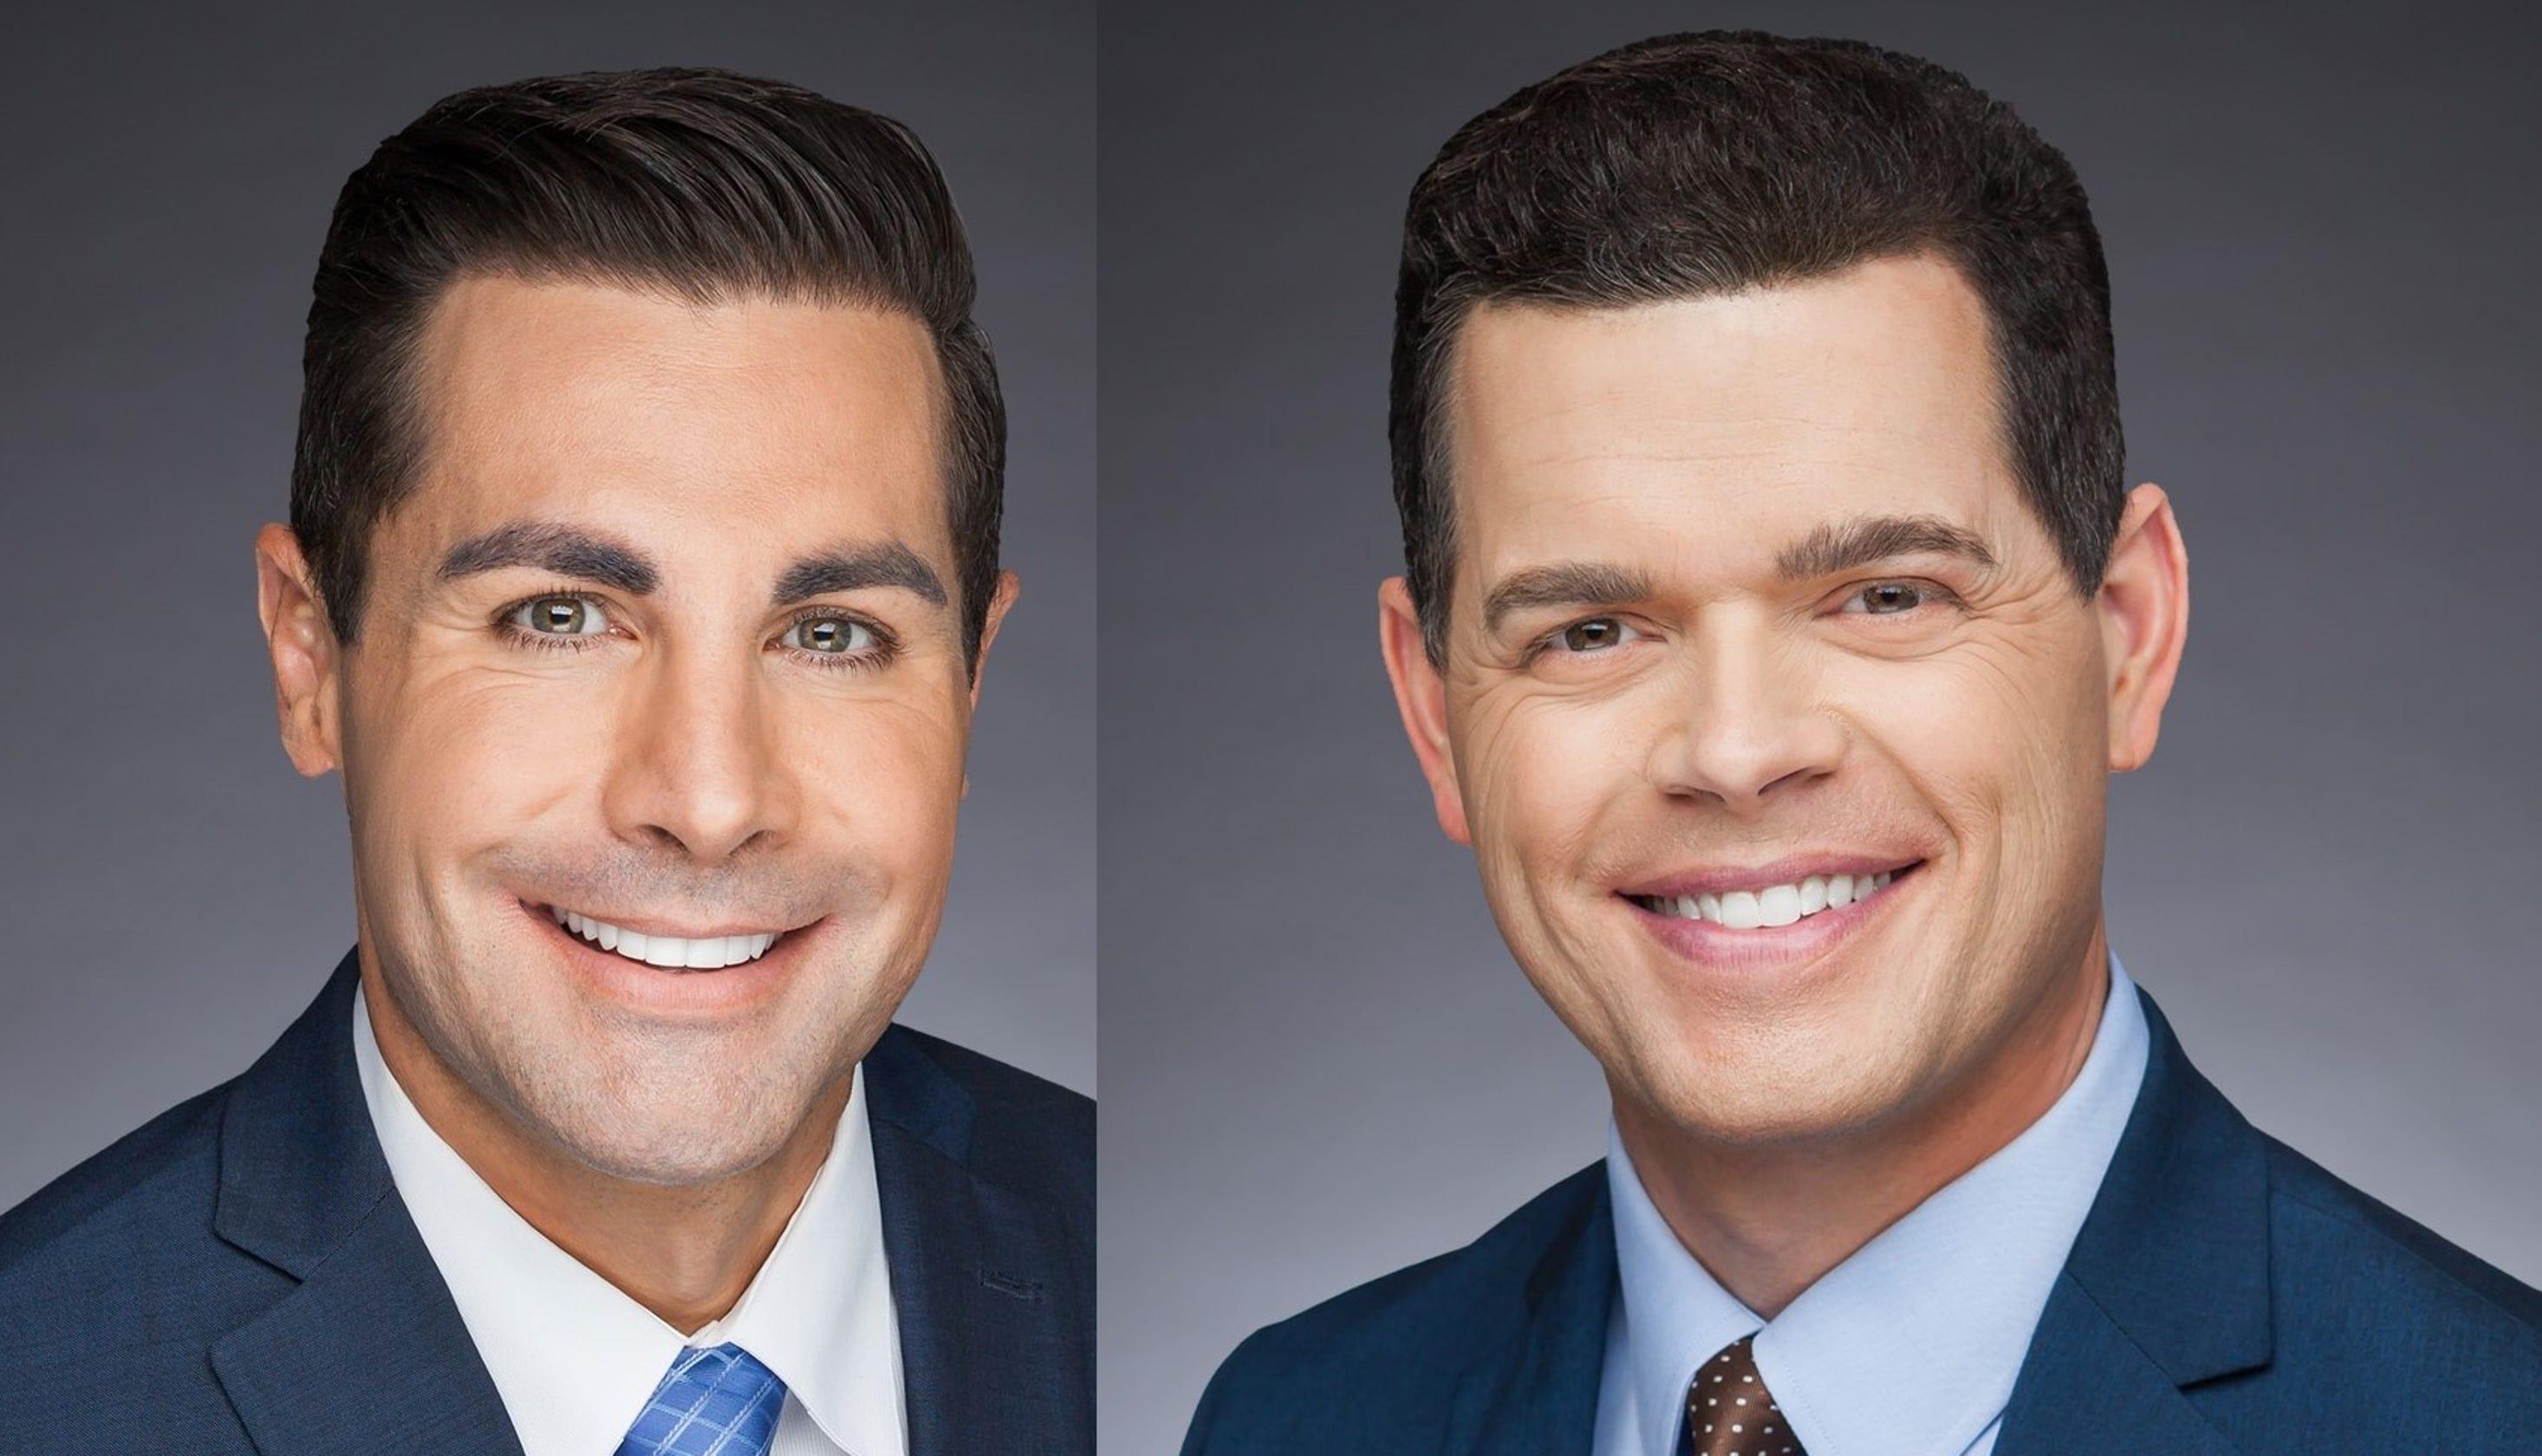 Brandon Lee leaving 3TV and Preston Phillips leaves CBS 5